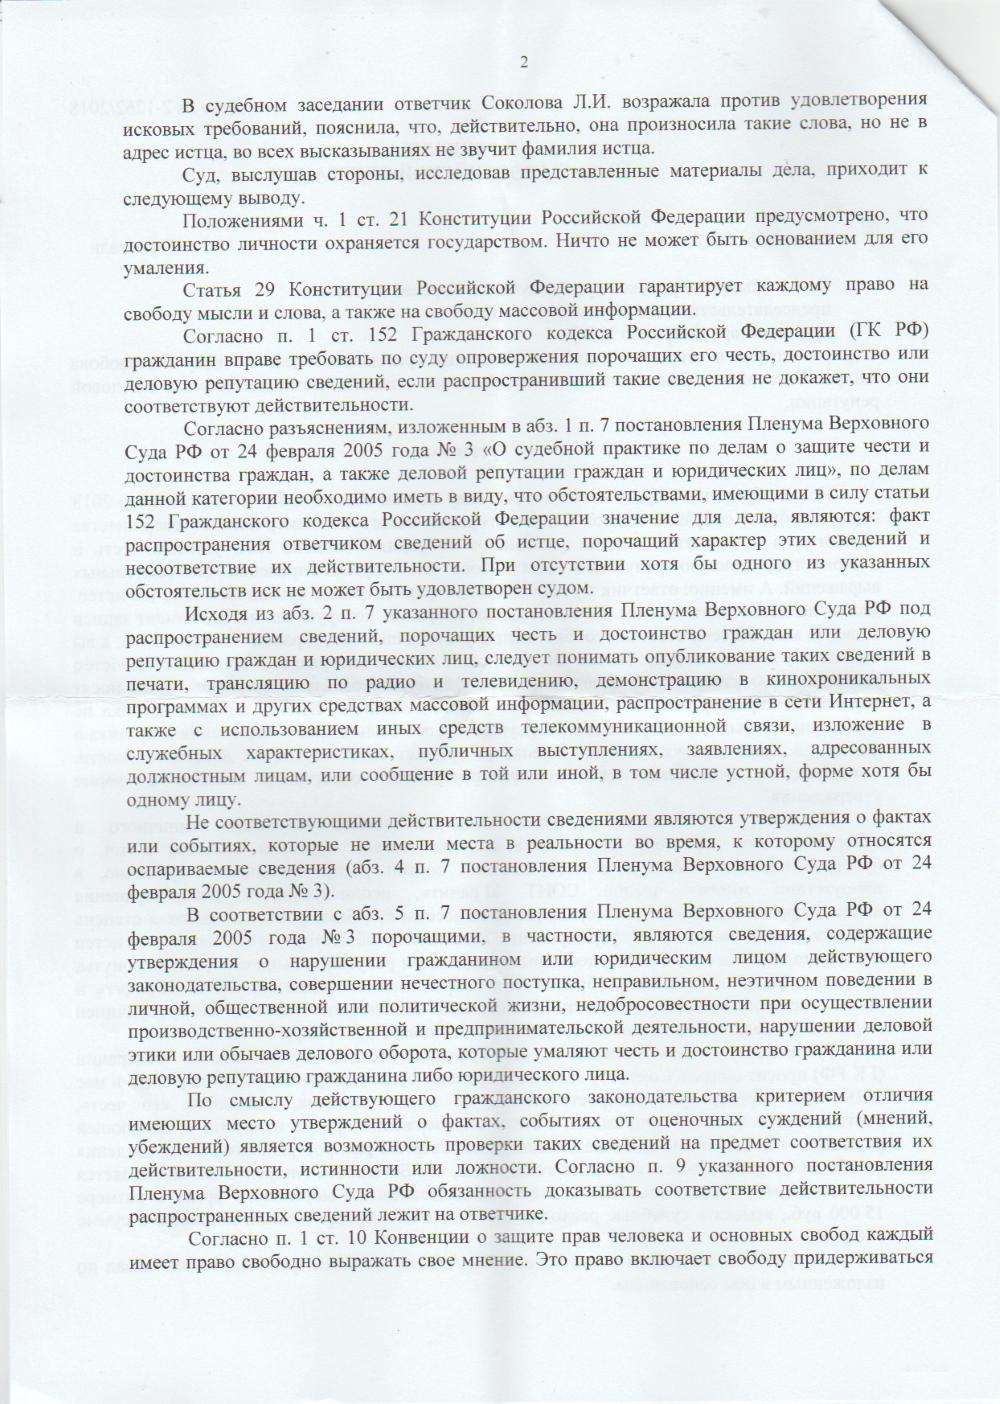 https://sontgranit.ru/forum/img/20181005-решение-суда3.png